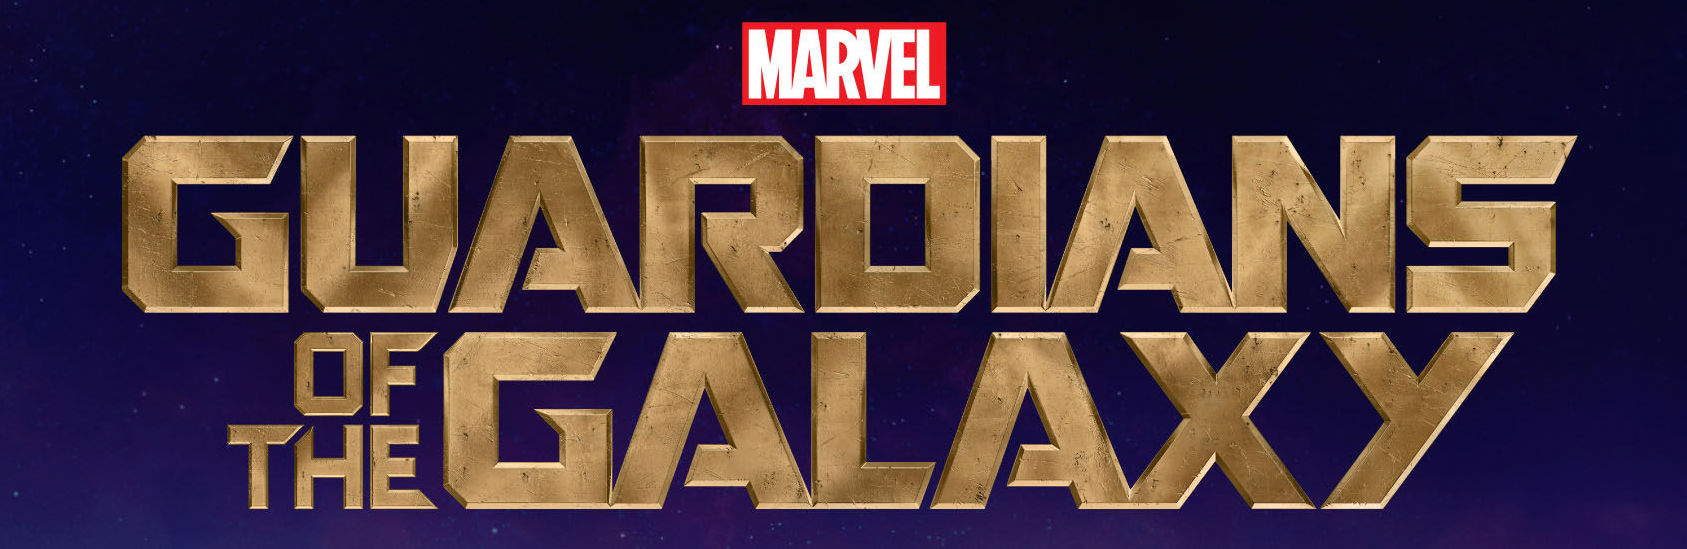 Marvel's Guardians of the Galaxy IMAX 3D Sneak Peek